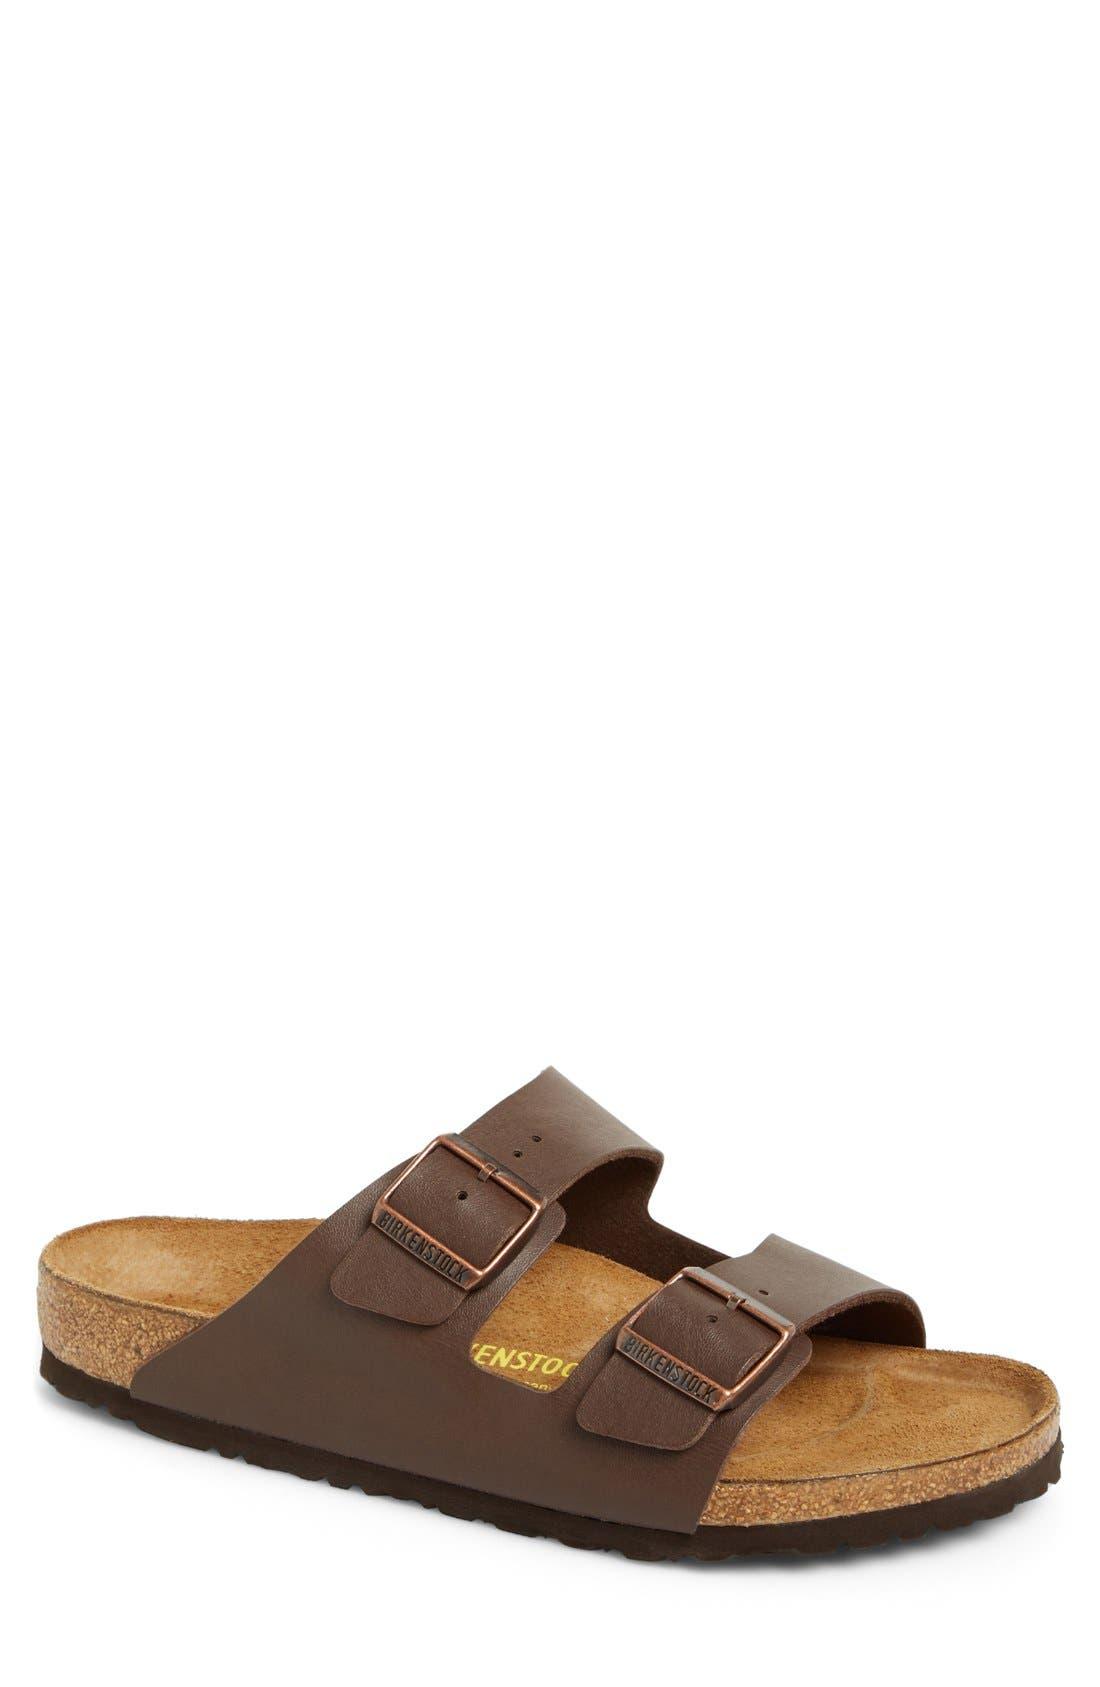 Alternate Image 1 Selected - Birkenstock 'Arizona' Slide Sandal (Men)